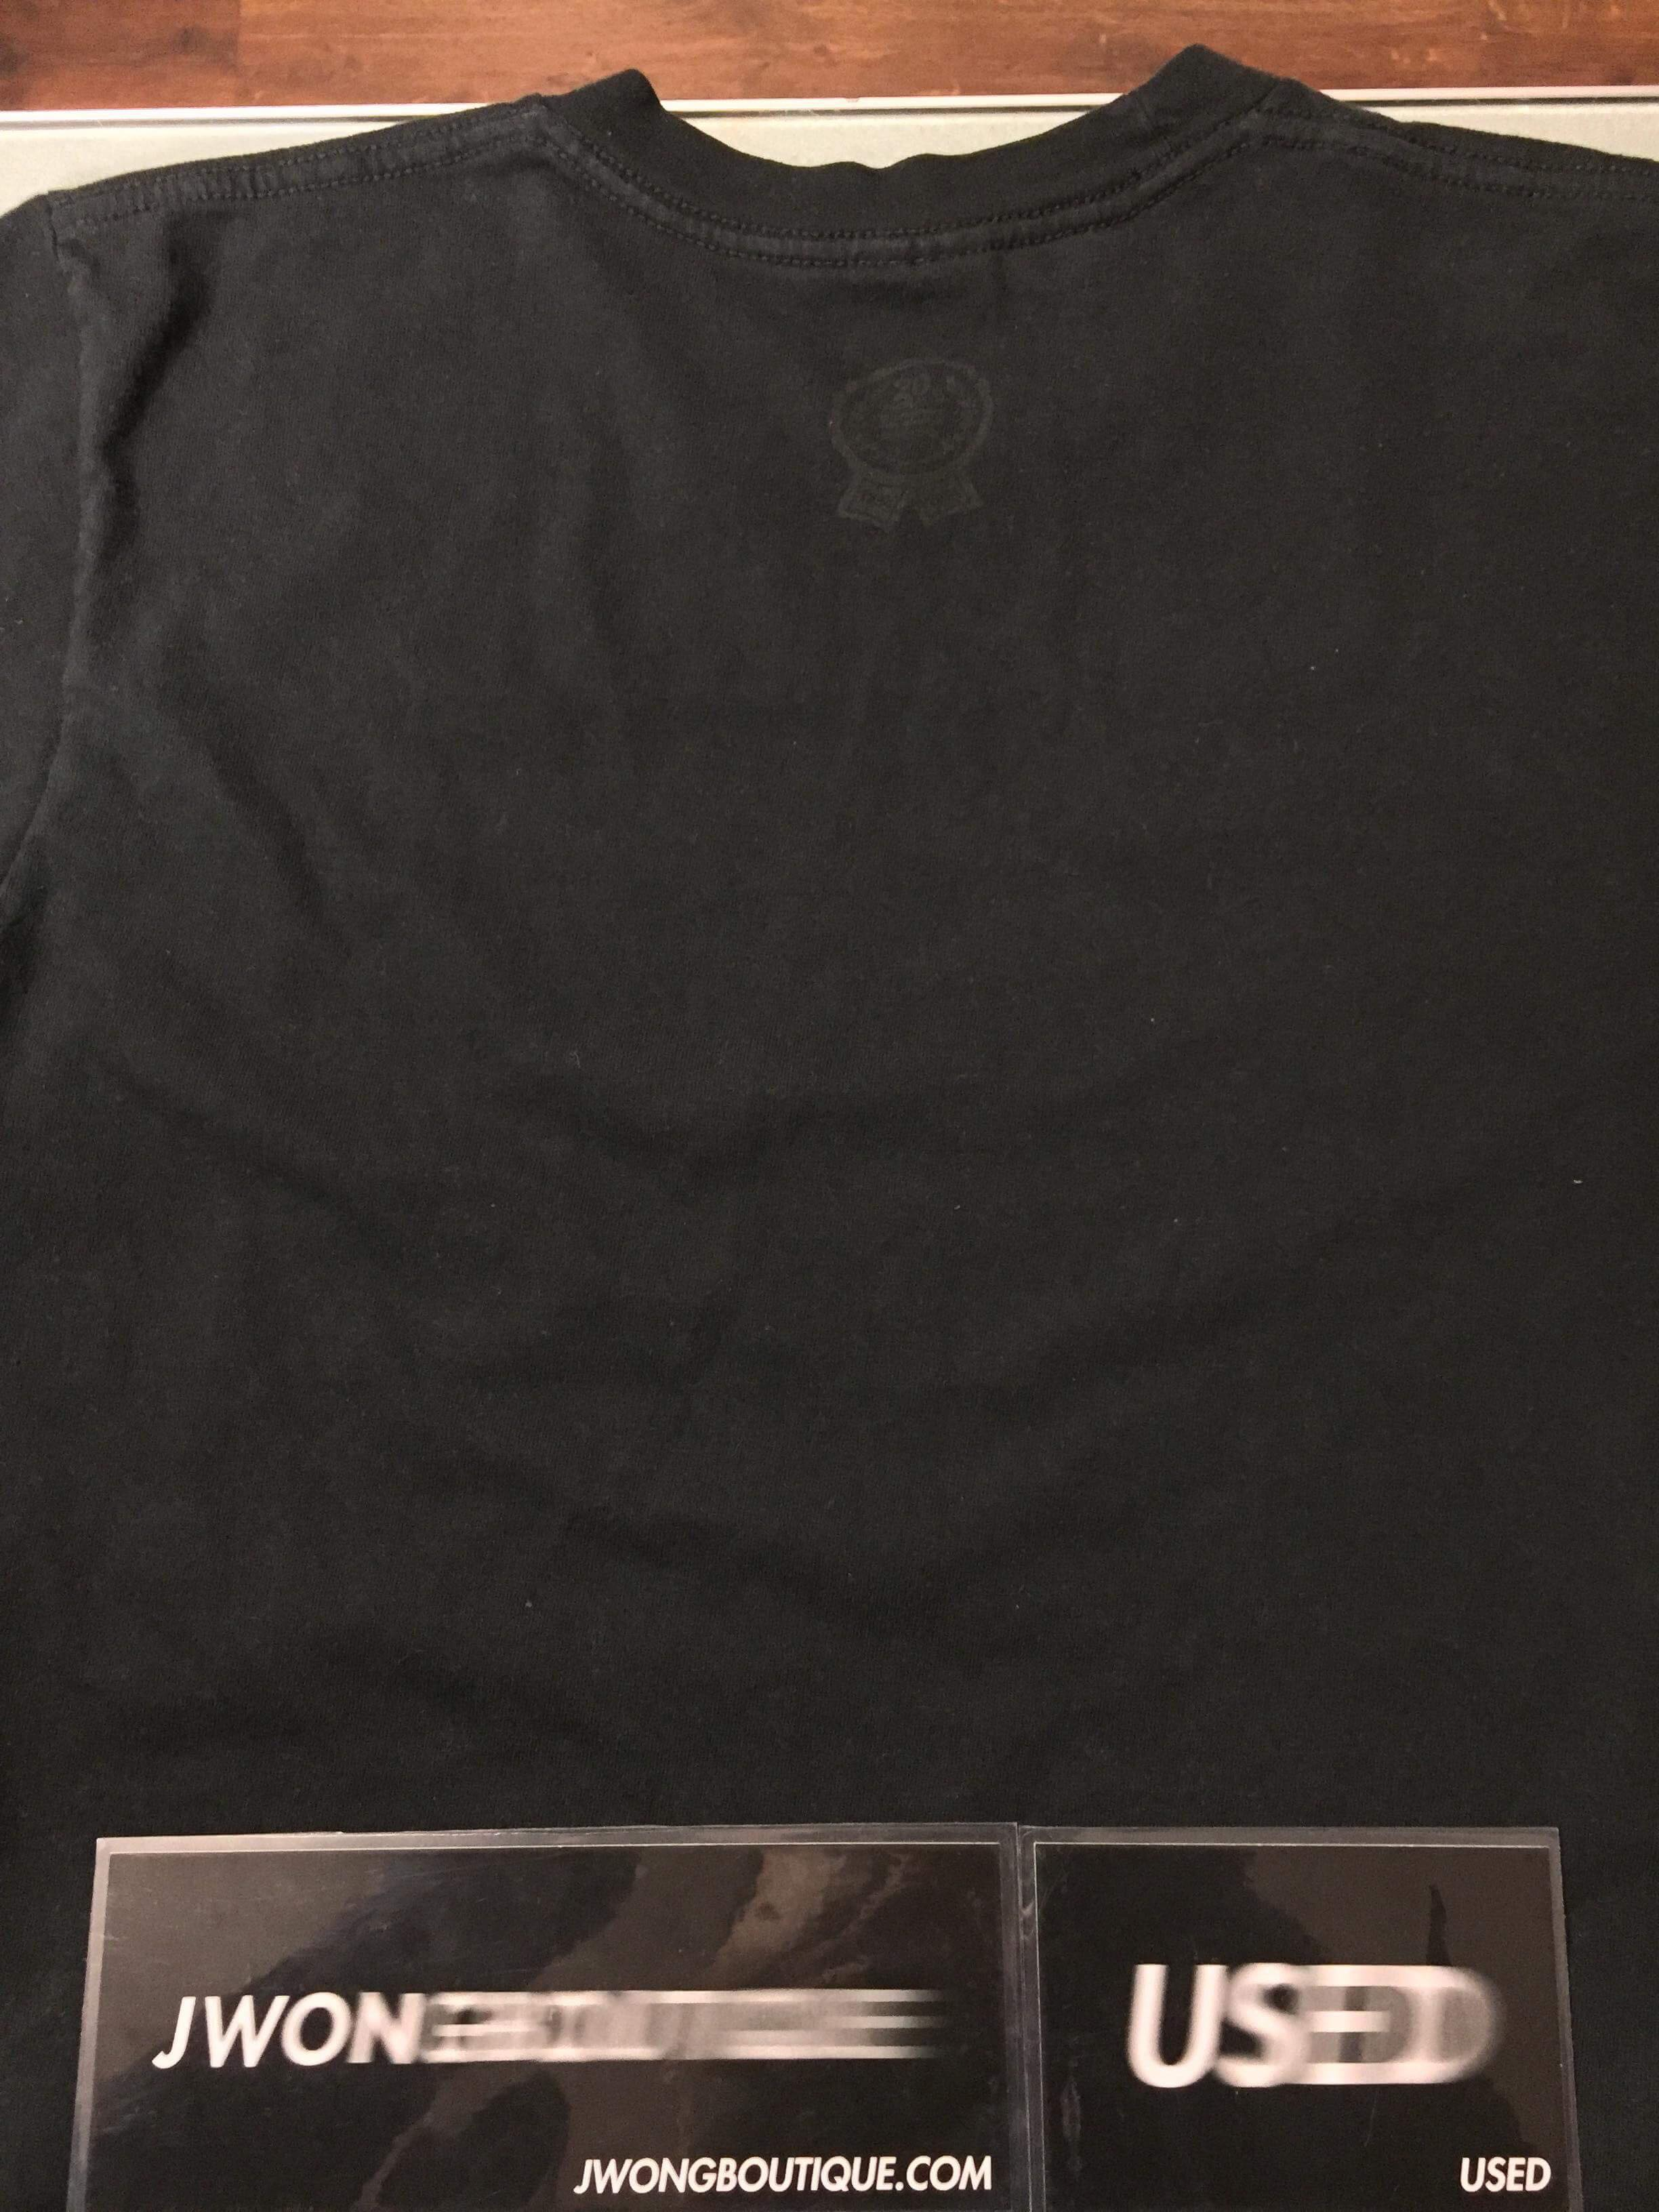 939f68aa398f 2014 Supreme Box Logo Tee 20th Year Anniversary Black   Jwong Boutique